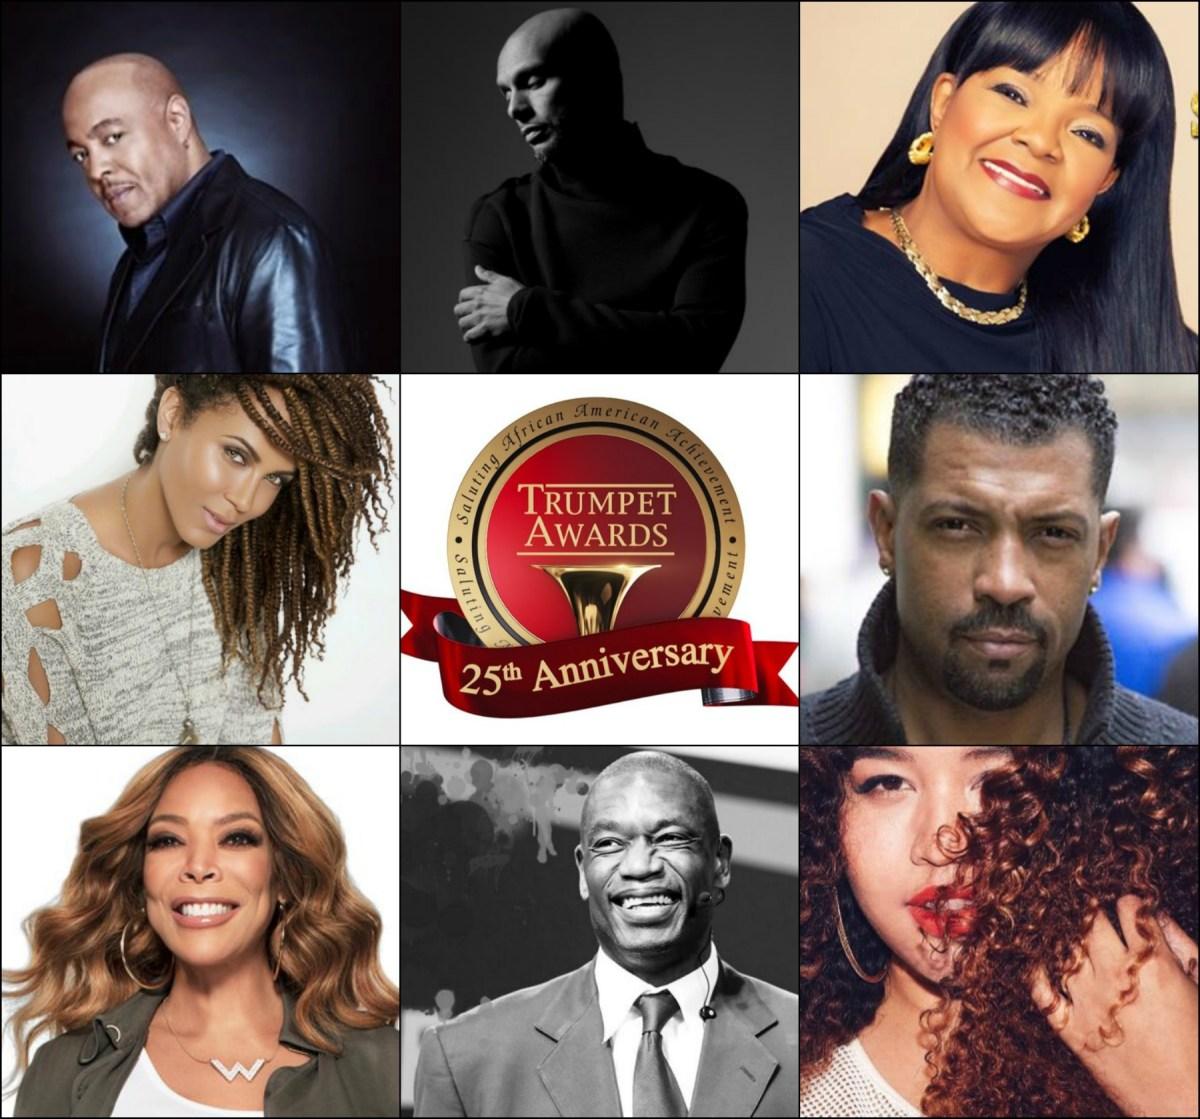 Trumpet Awards Celebrates 25th Anniversary